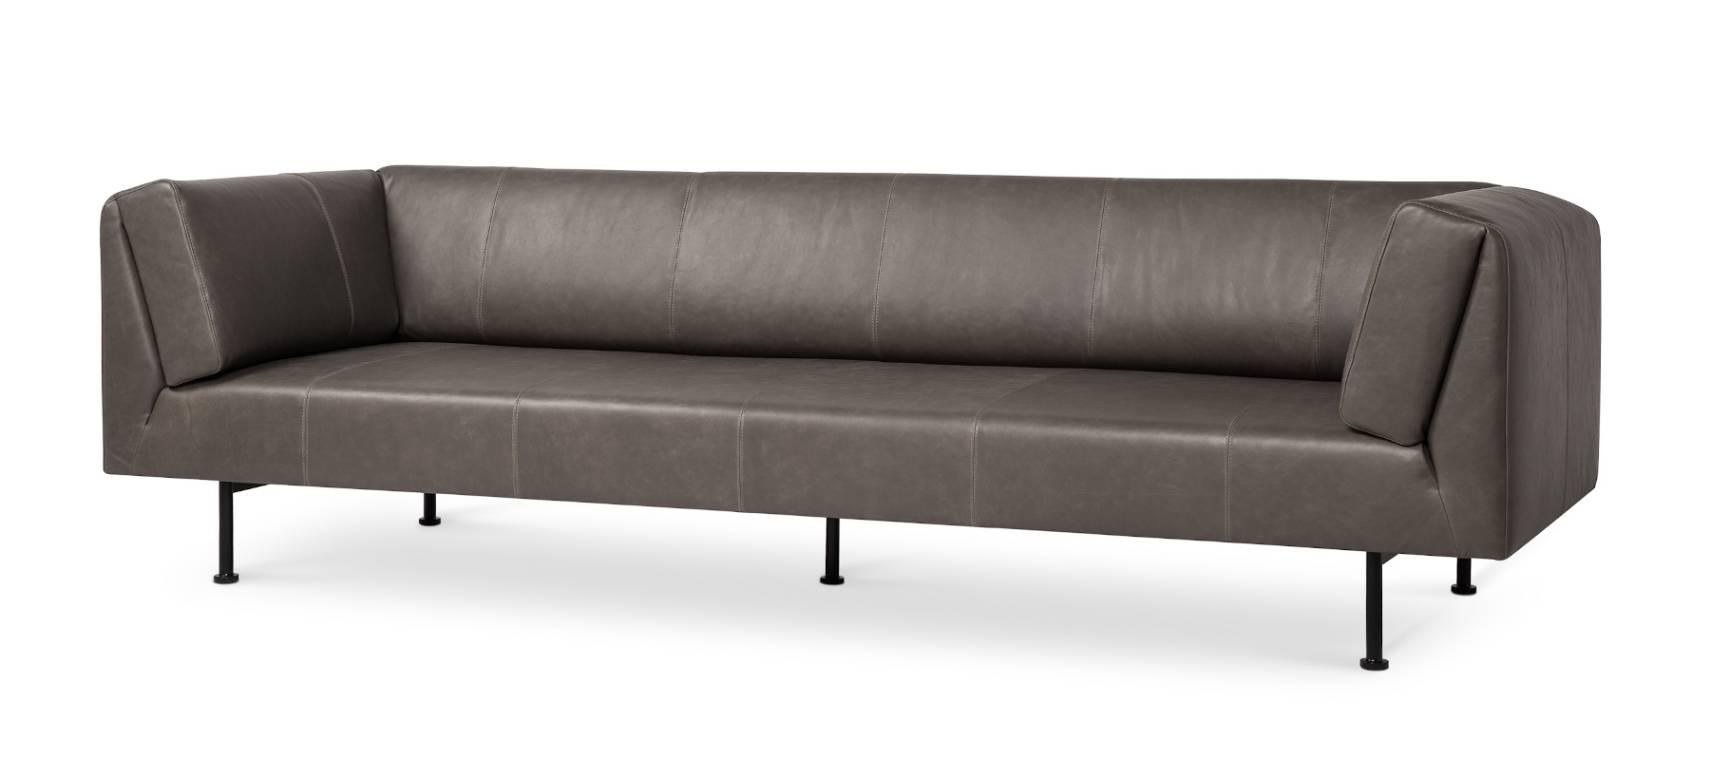 Noti Muse Sofa 3-Sitzer Design Möbel